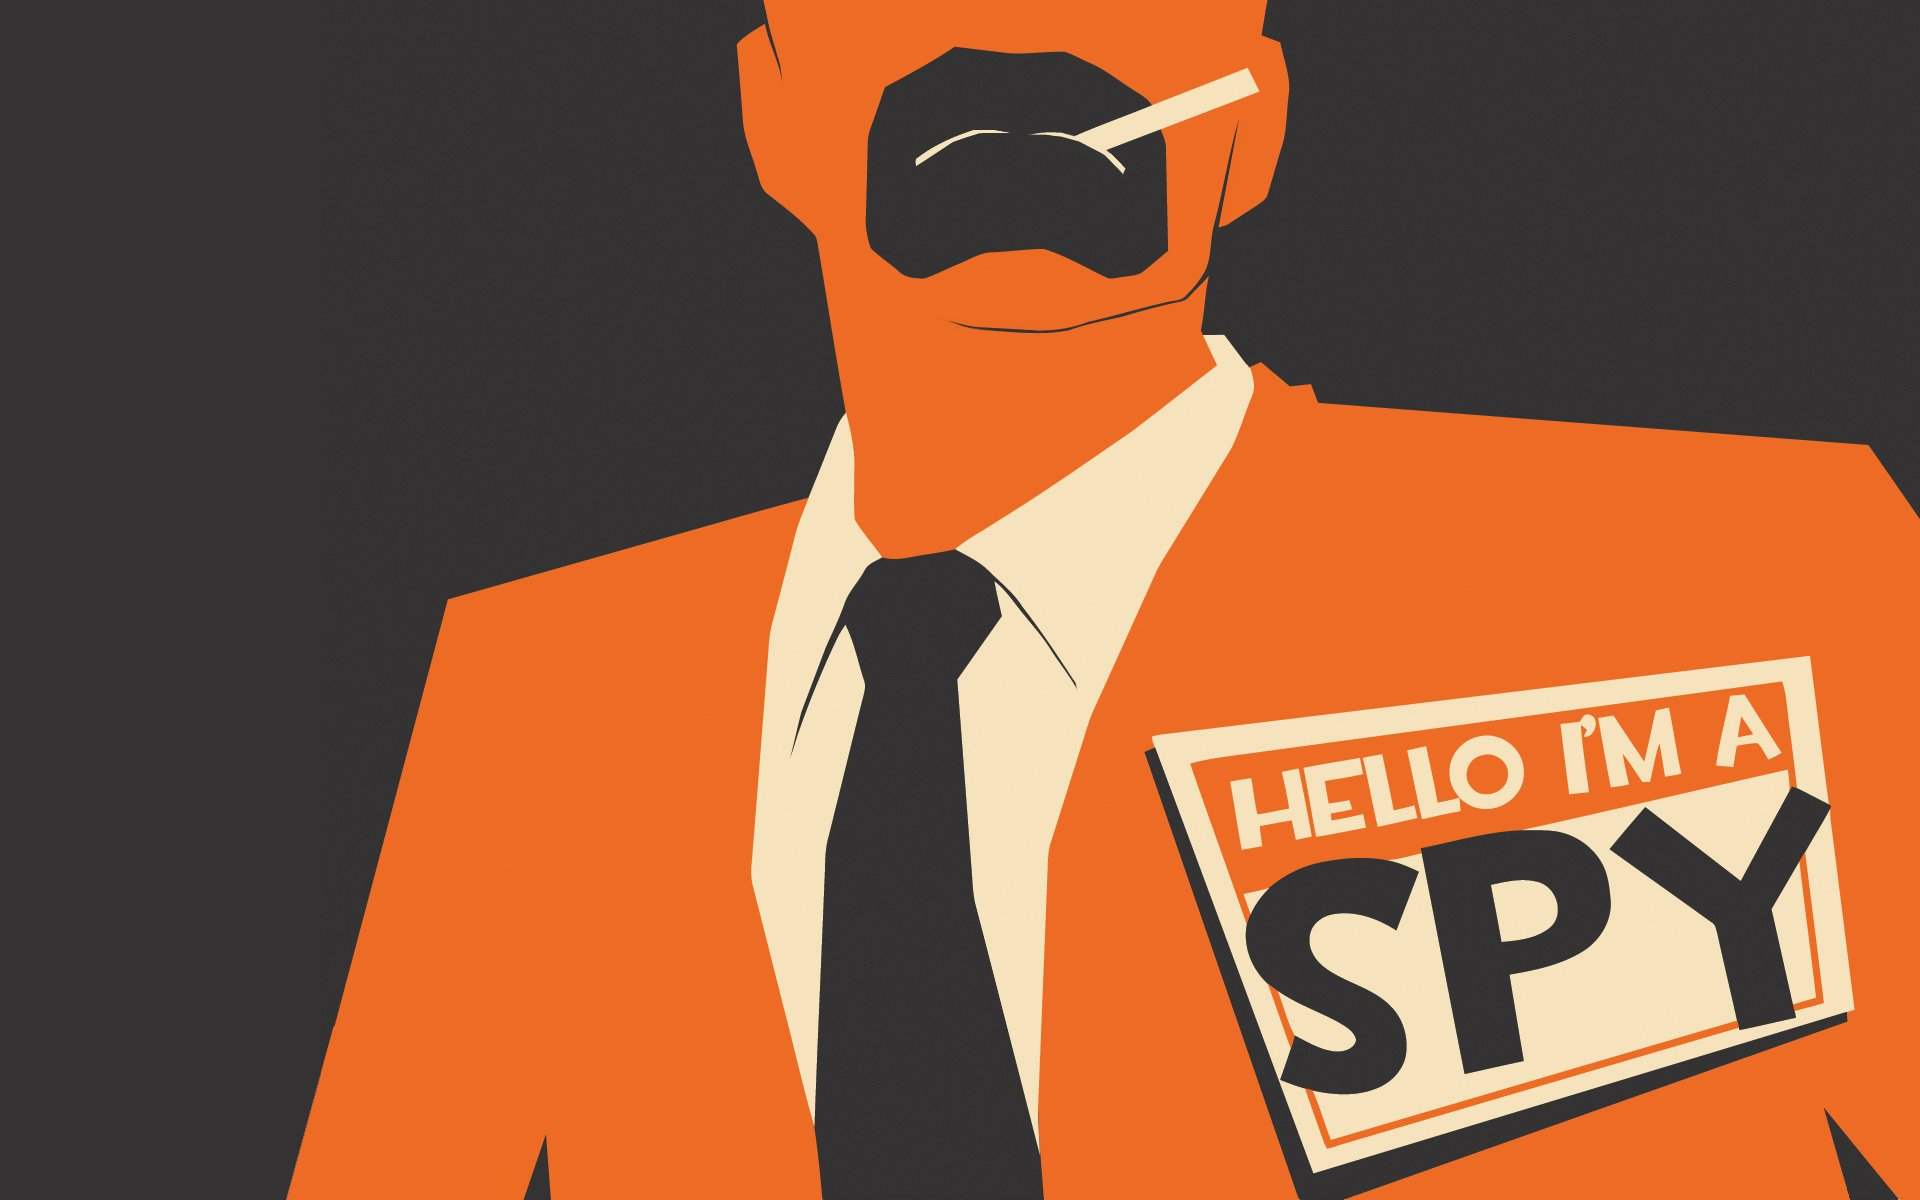 Spy Wallpapers Hello Im A Spy Myspace Backgrounds Hello Im A Spy 1920x1200